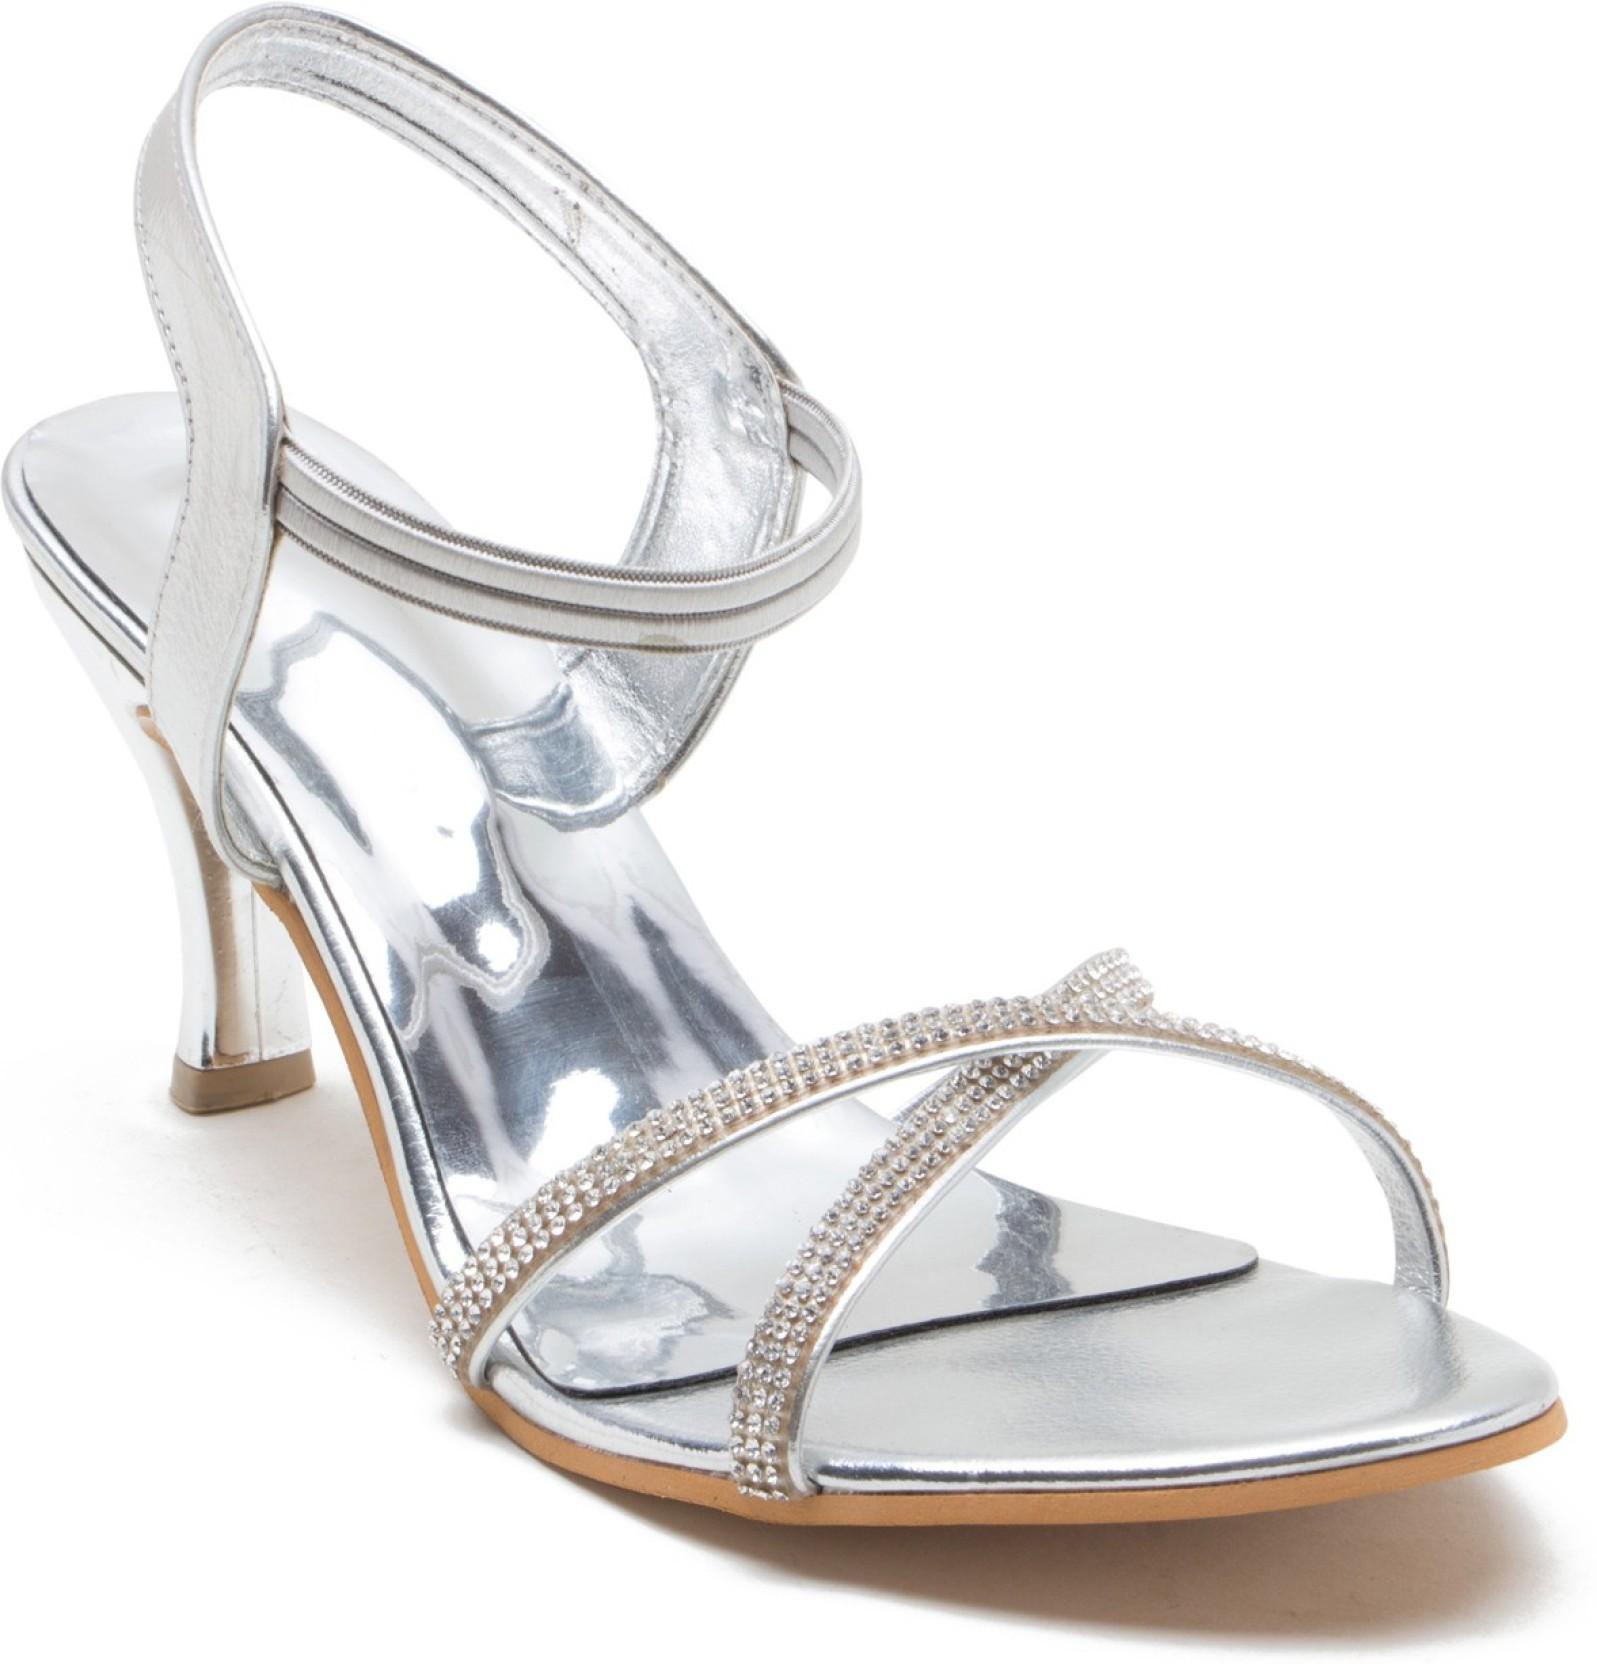 d27d892ca8d NAAZ Women Silver Heels - Buy NAAZ Women Silver Heels Online at Best ...